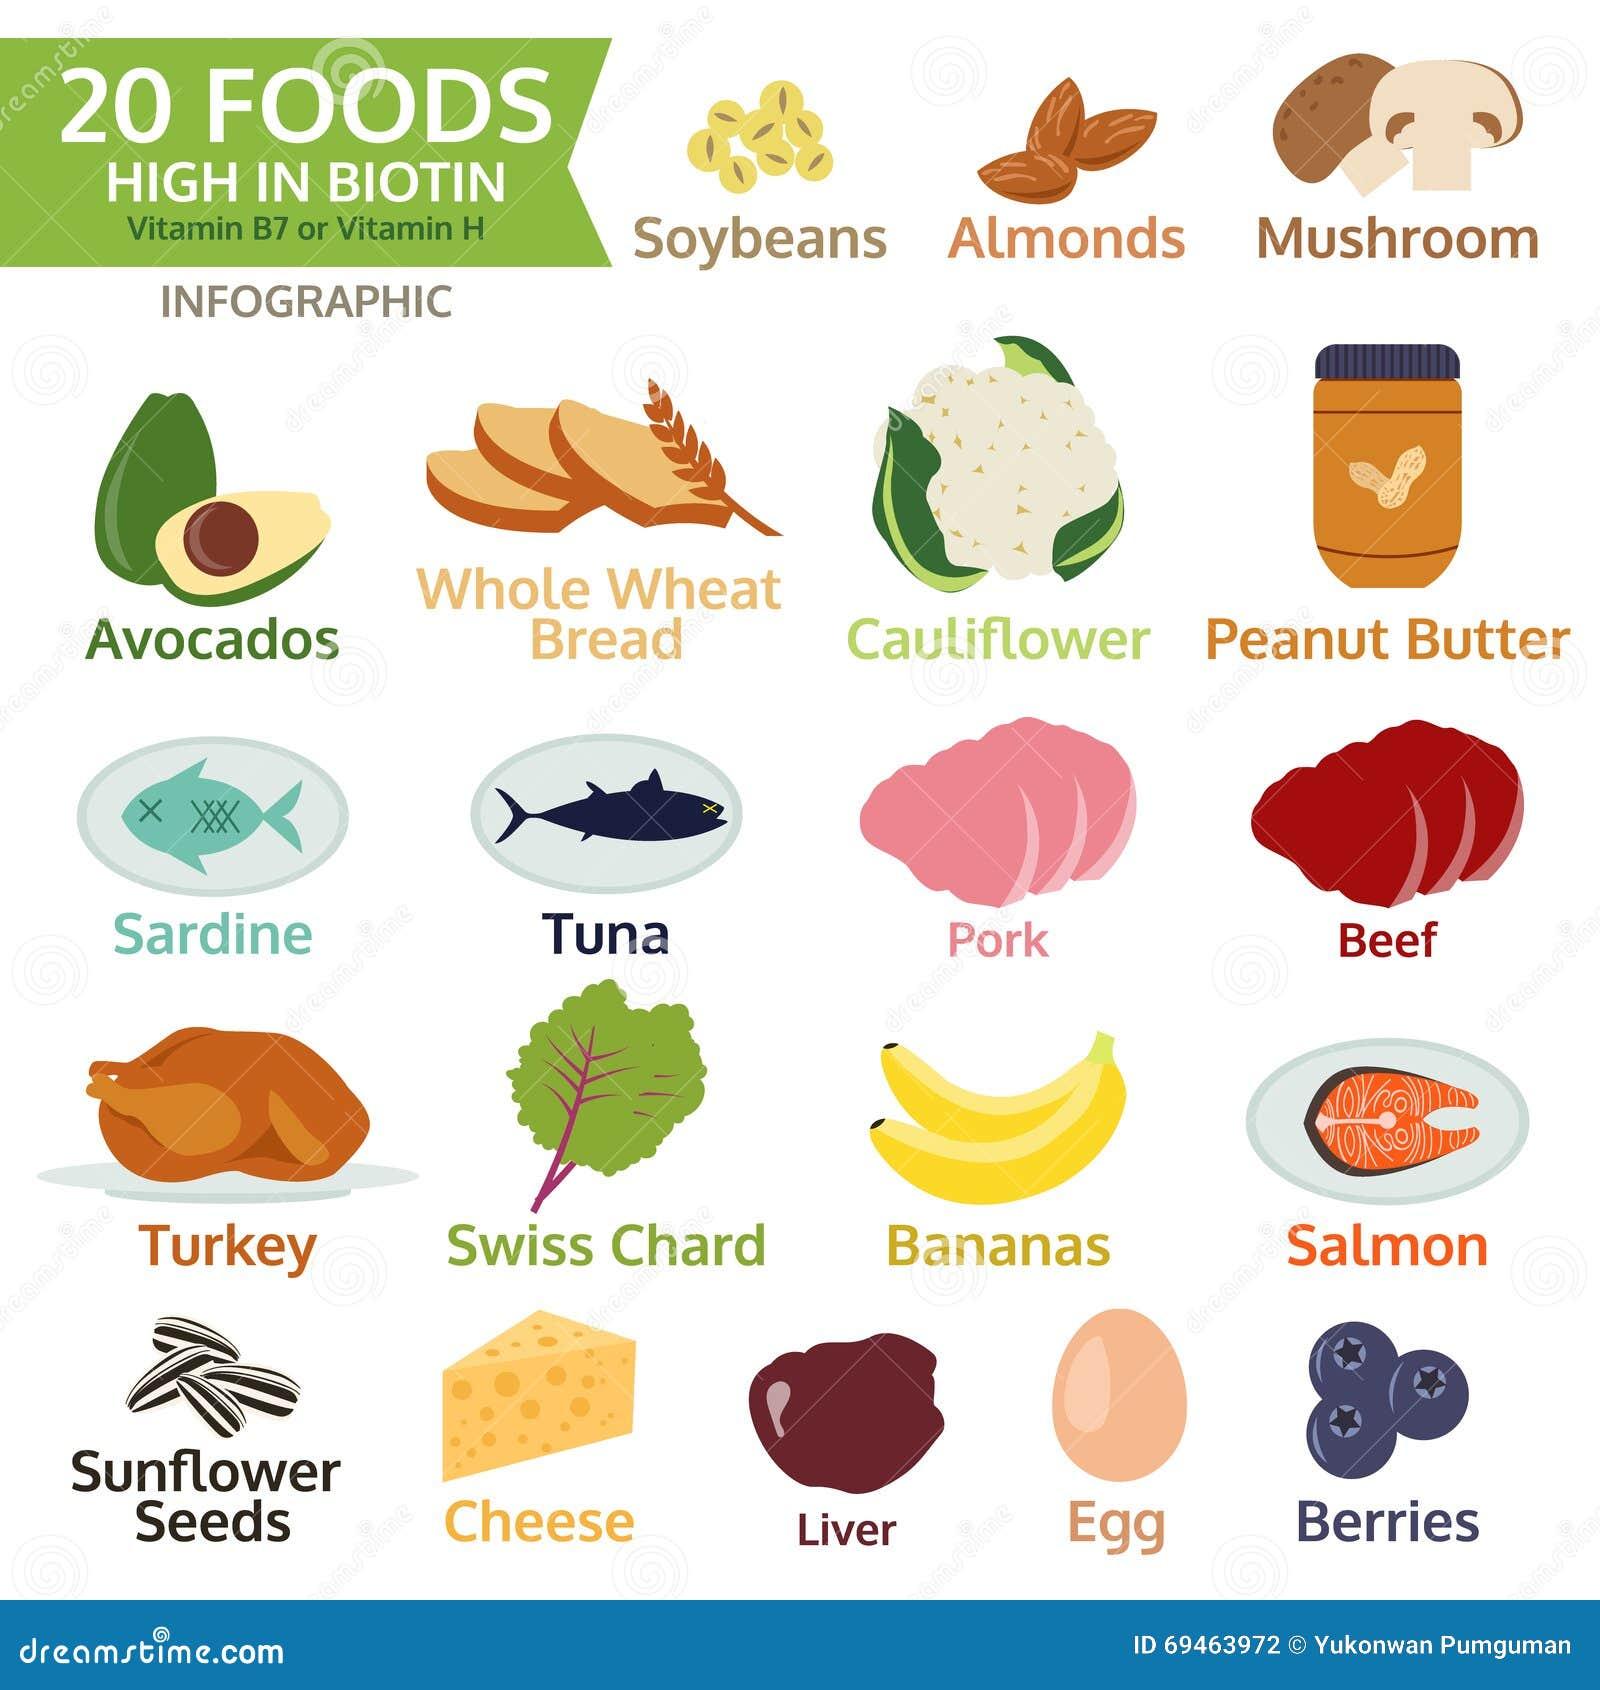 vingt nourritures hautes en biotine vitamine b ou